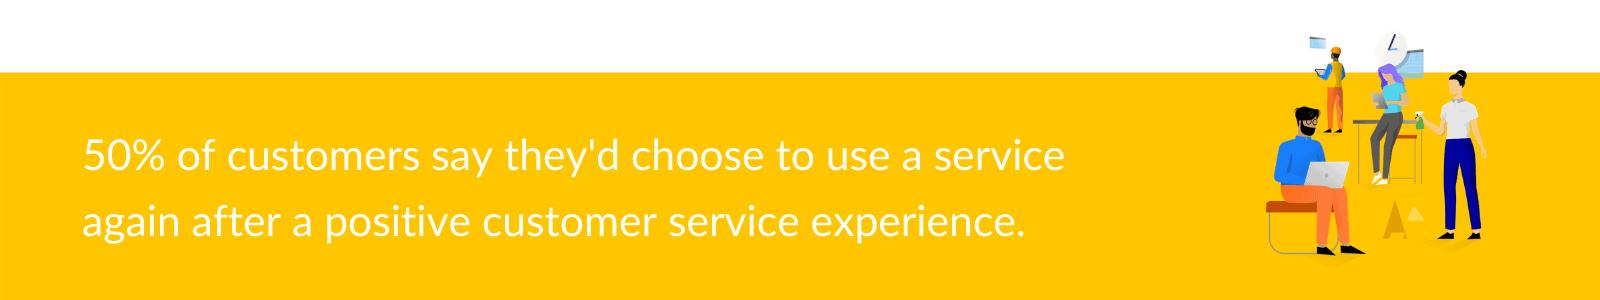 Construction customer service statistic #3